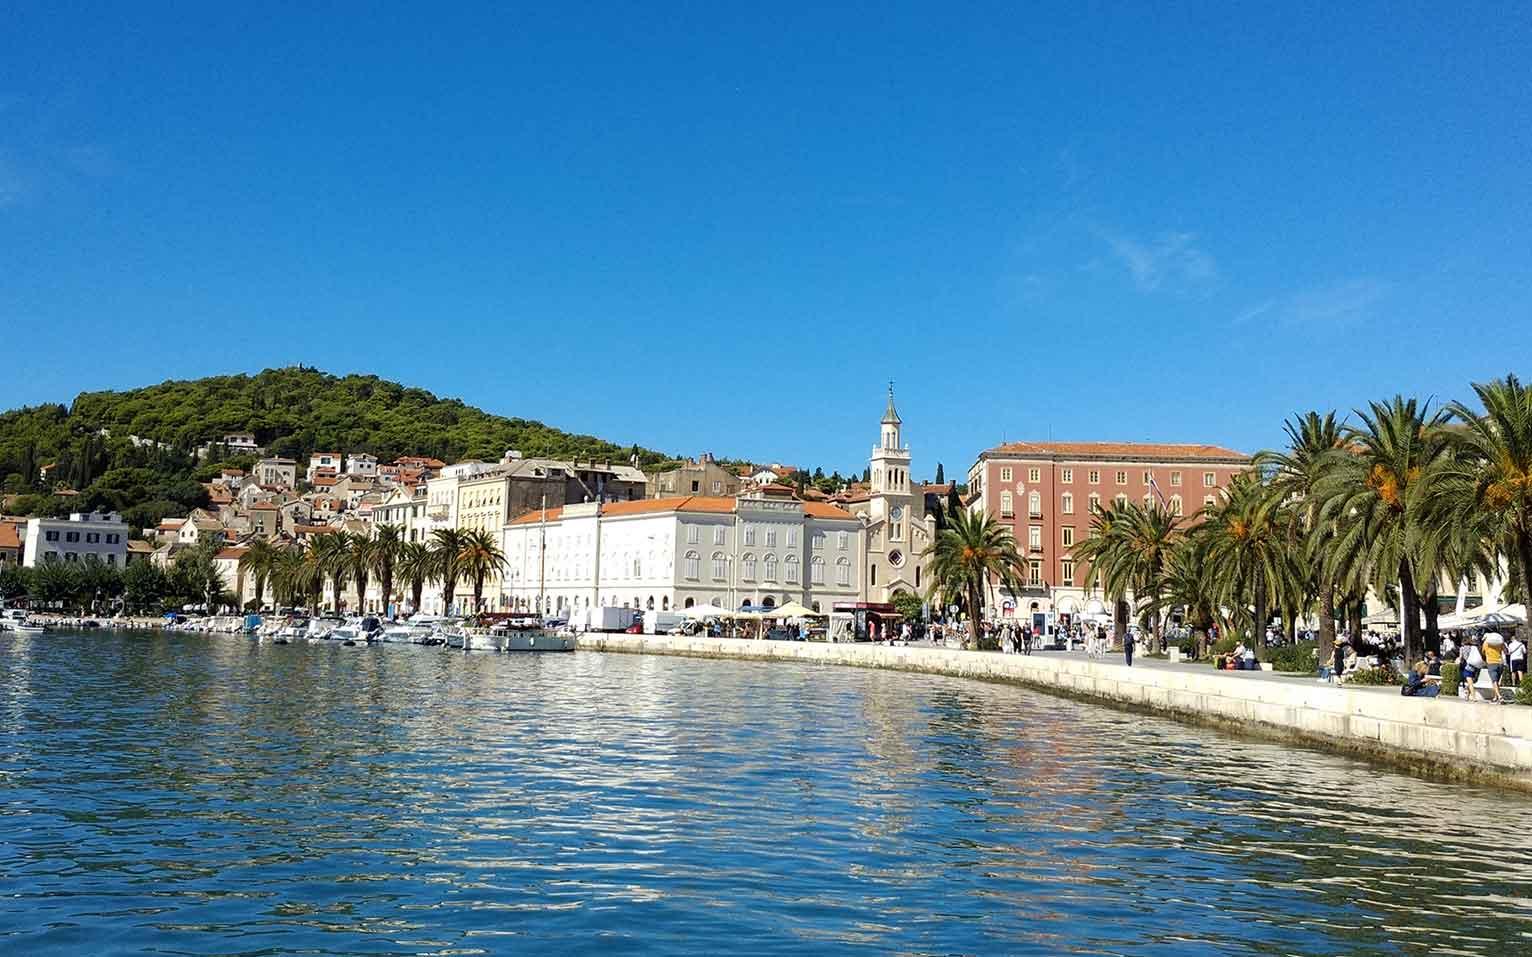 Spiagge a Spalato: consigli per un weekend